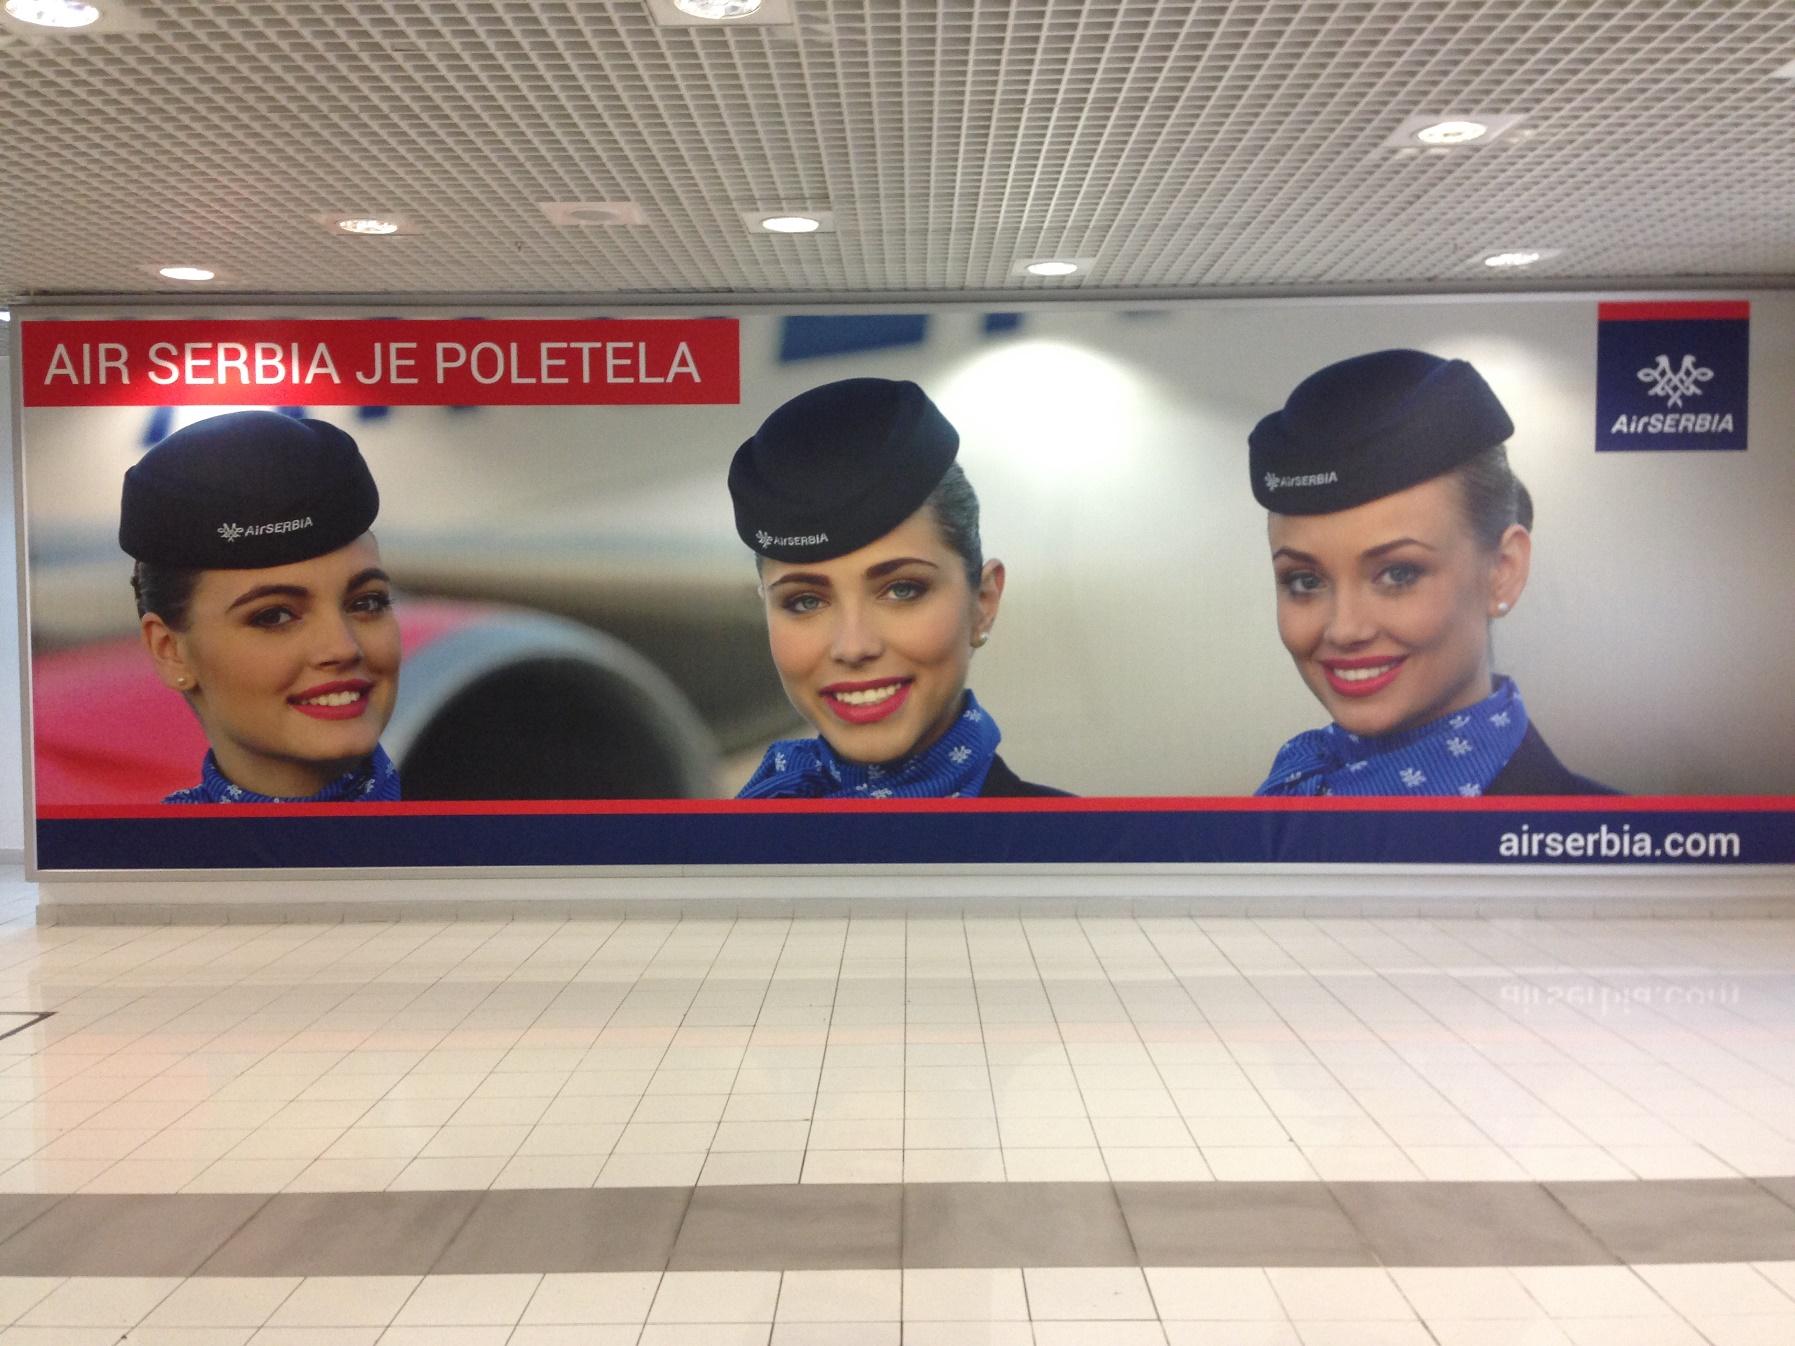 Air Serbia Je Poletela